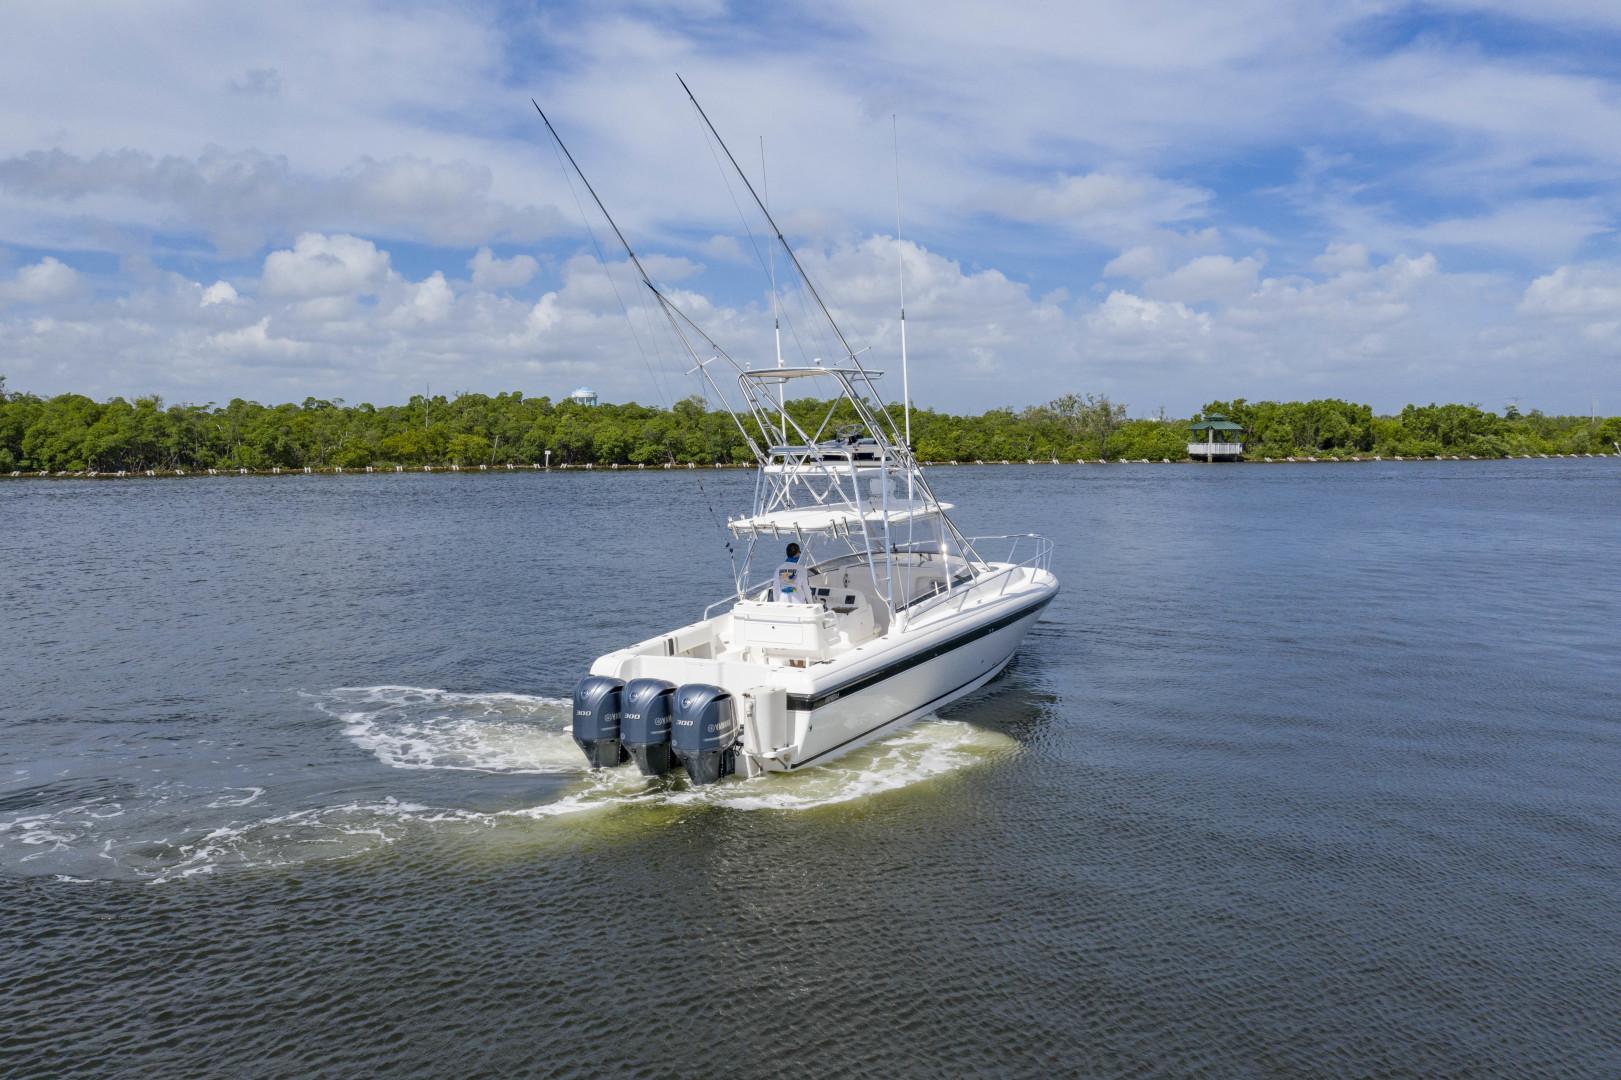 Intrepid-377 Walkaround 2005-Rock Boat REFIT 2018 Dania Beach-Florida-United States-377 Intrepid Profile Transom 2-1511556 | Thumbnail